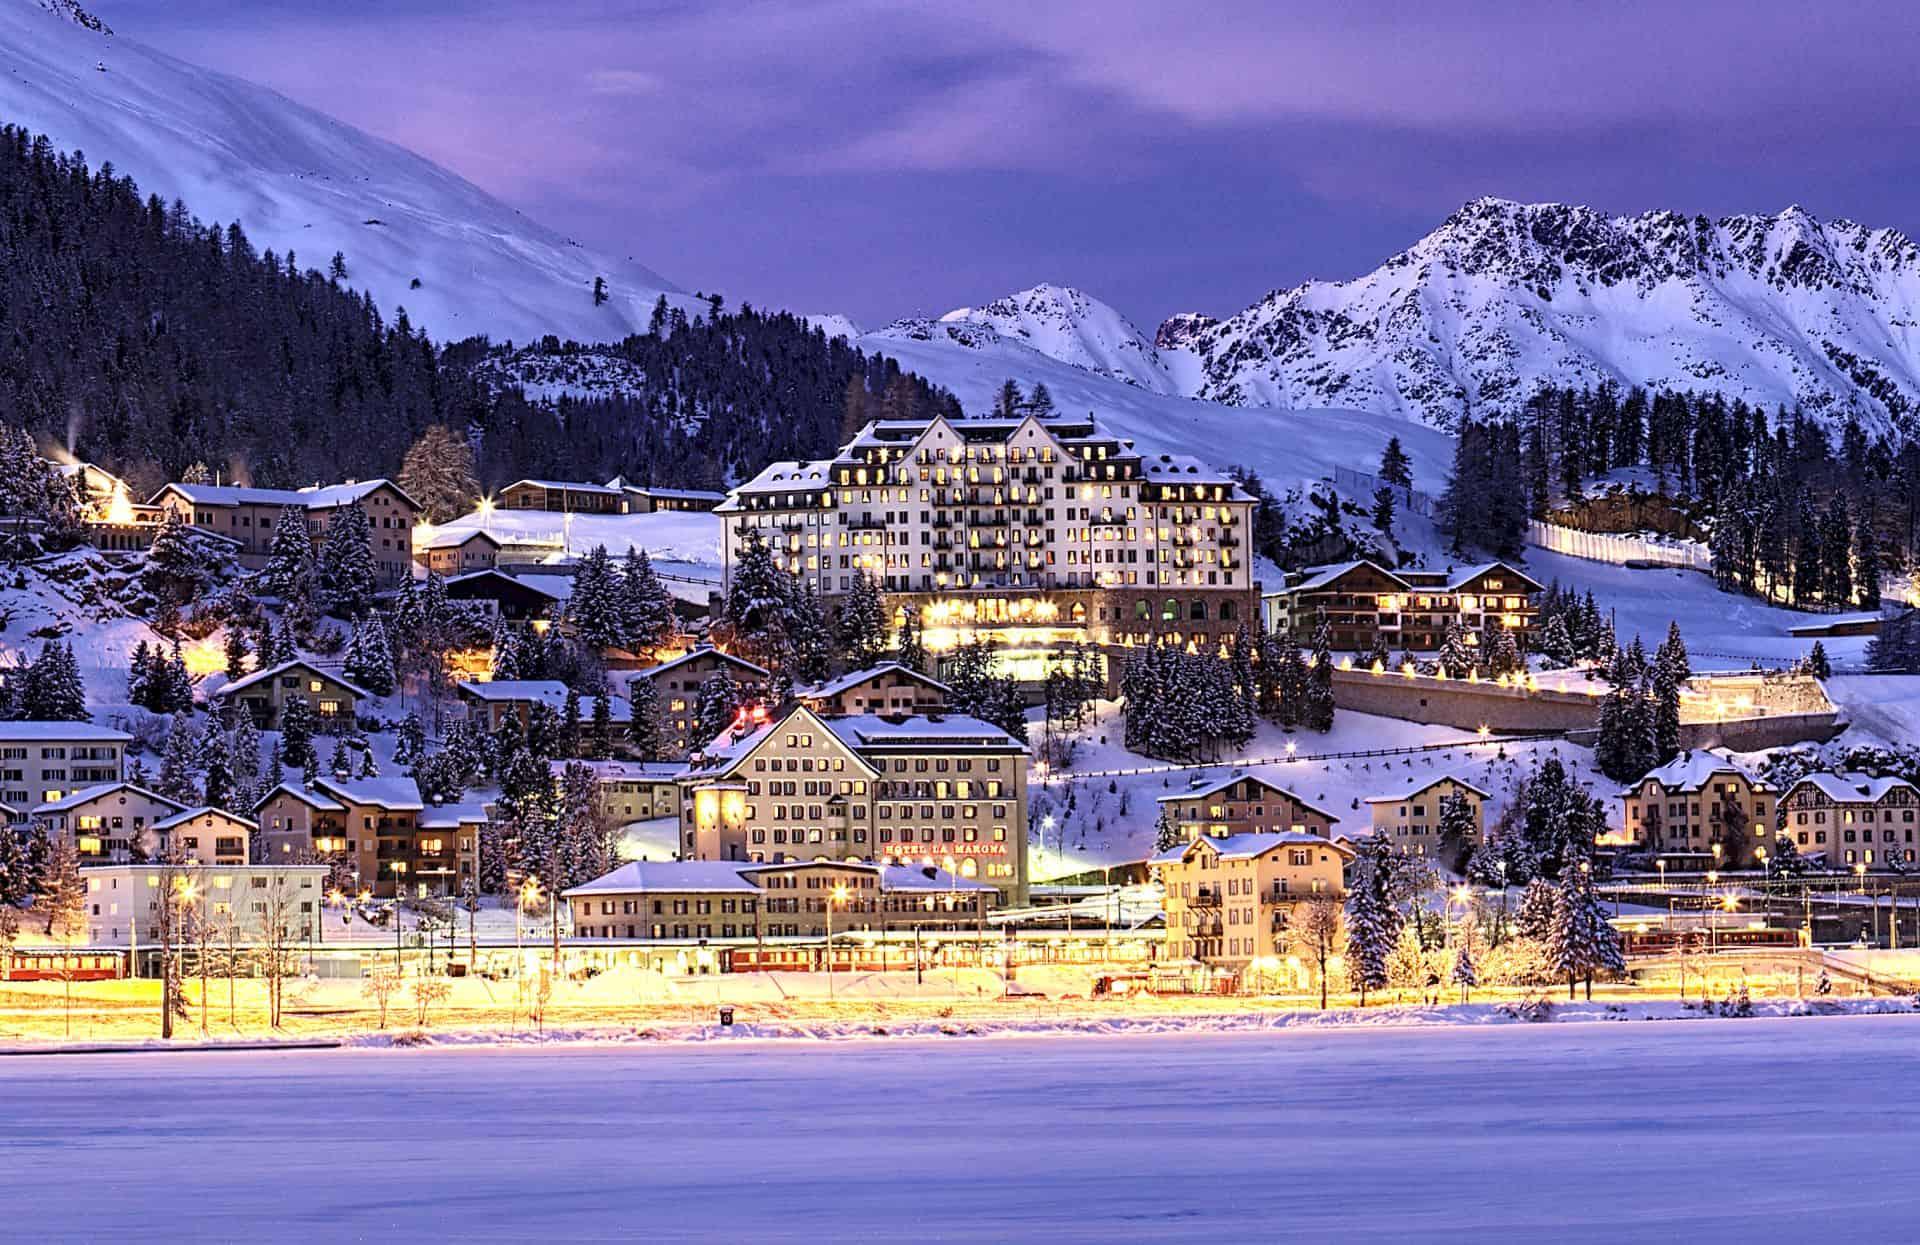 Carlton hotel St Moritz Switzerland